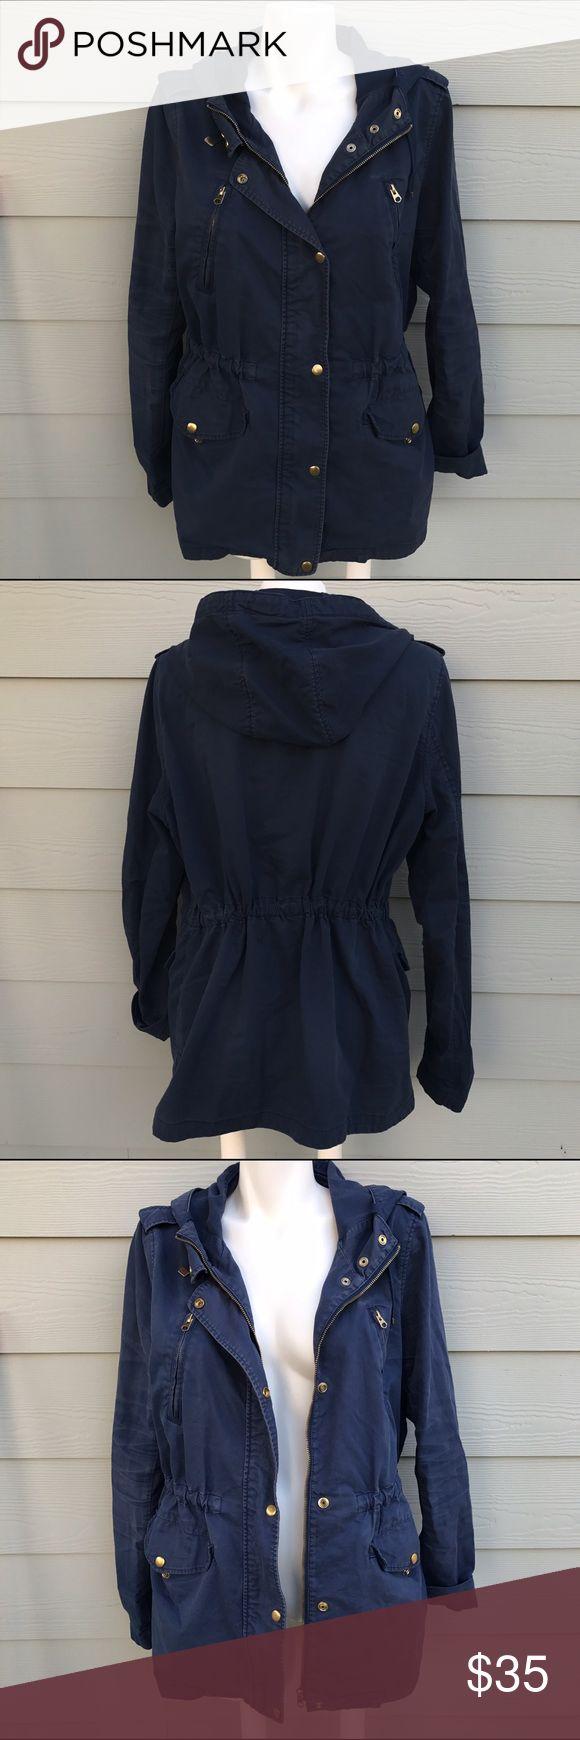 TOPSHOP Navy Colour Block Parka Jacket In good condition Topshop Jackets & Coats Utility Jackets